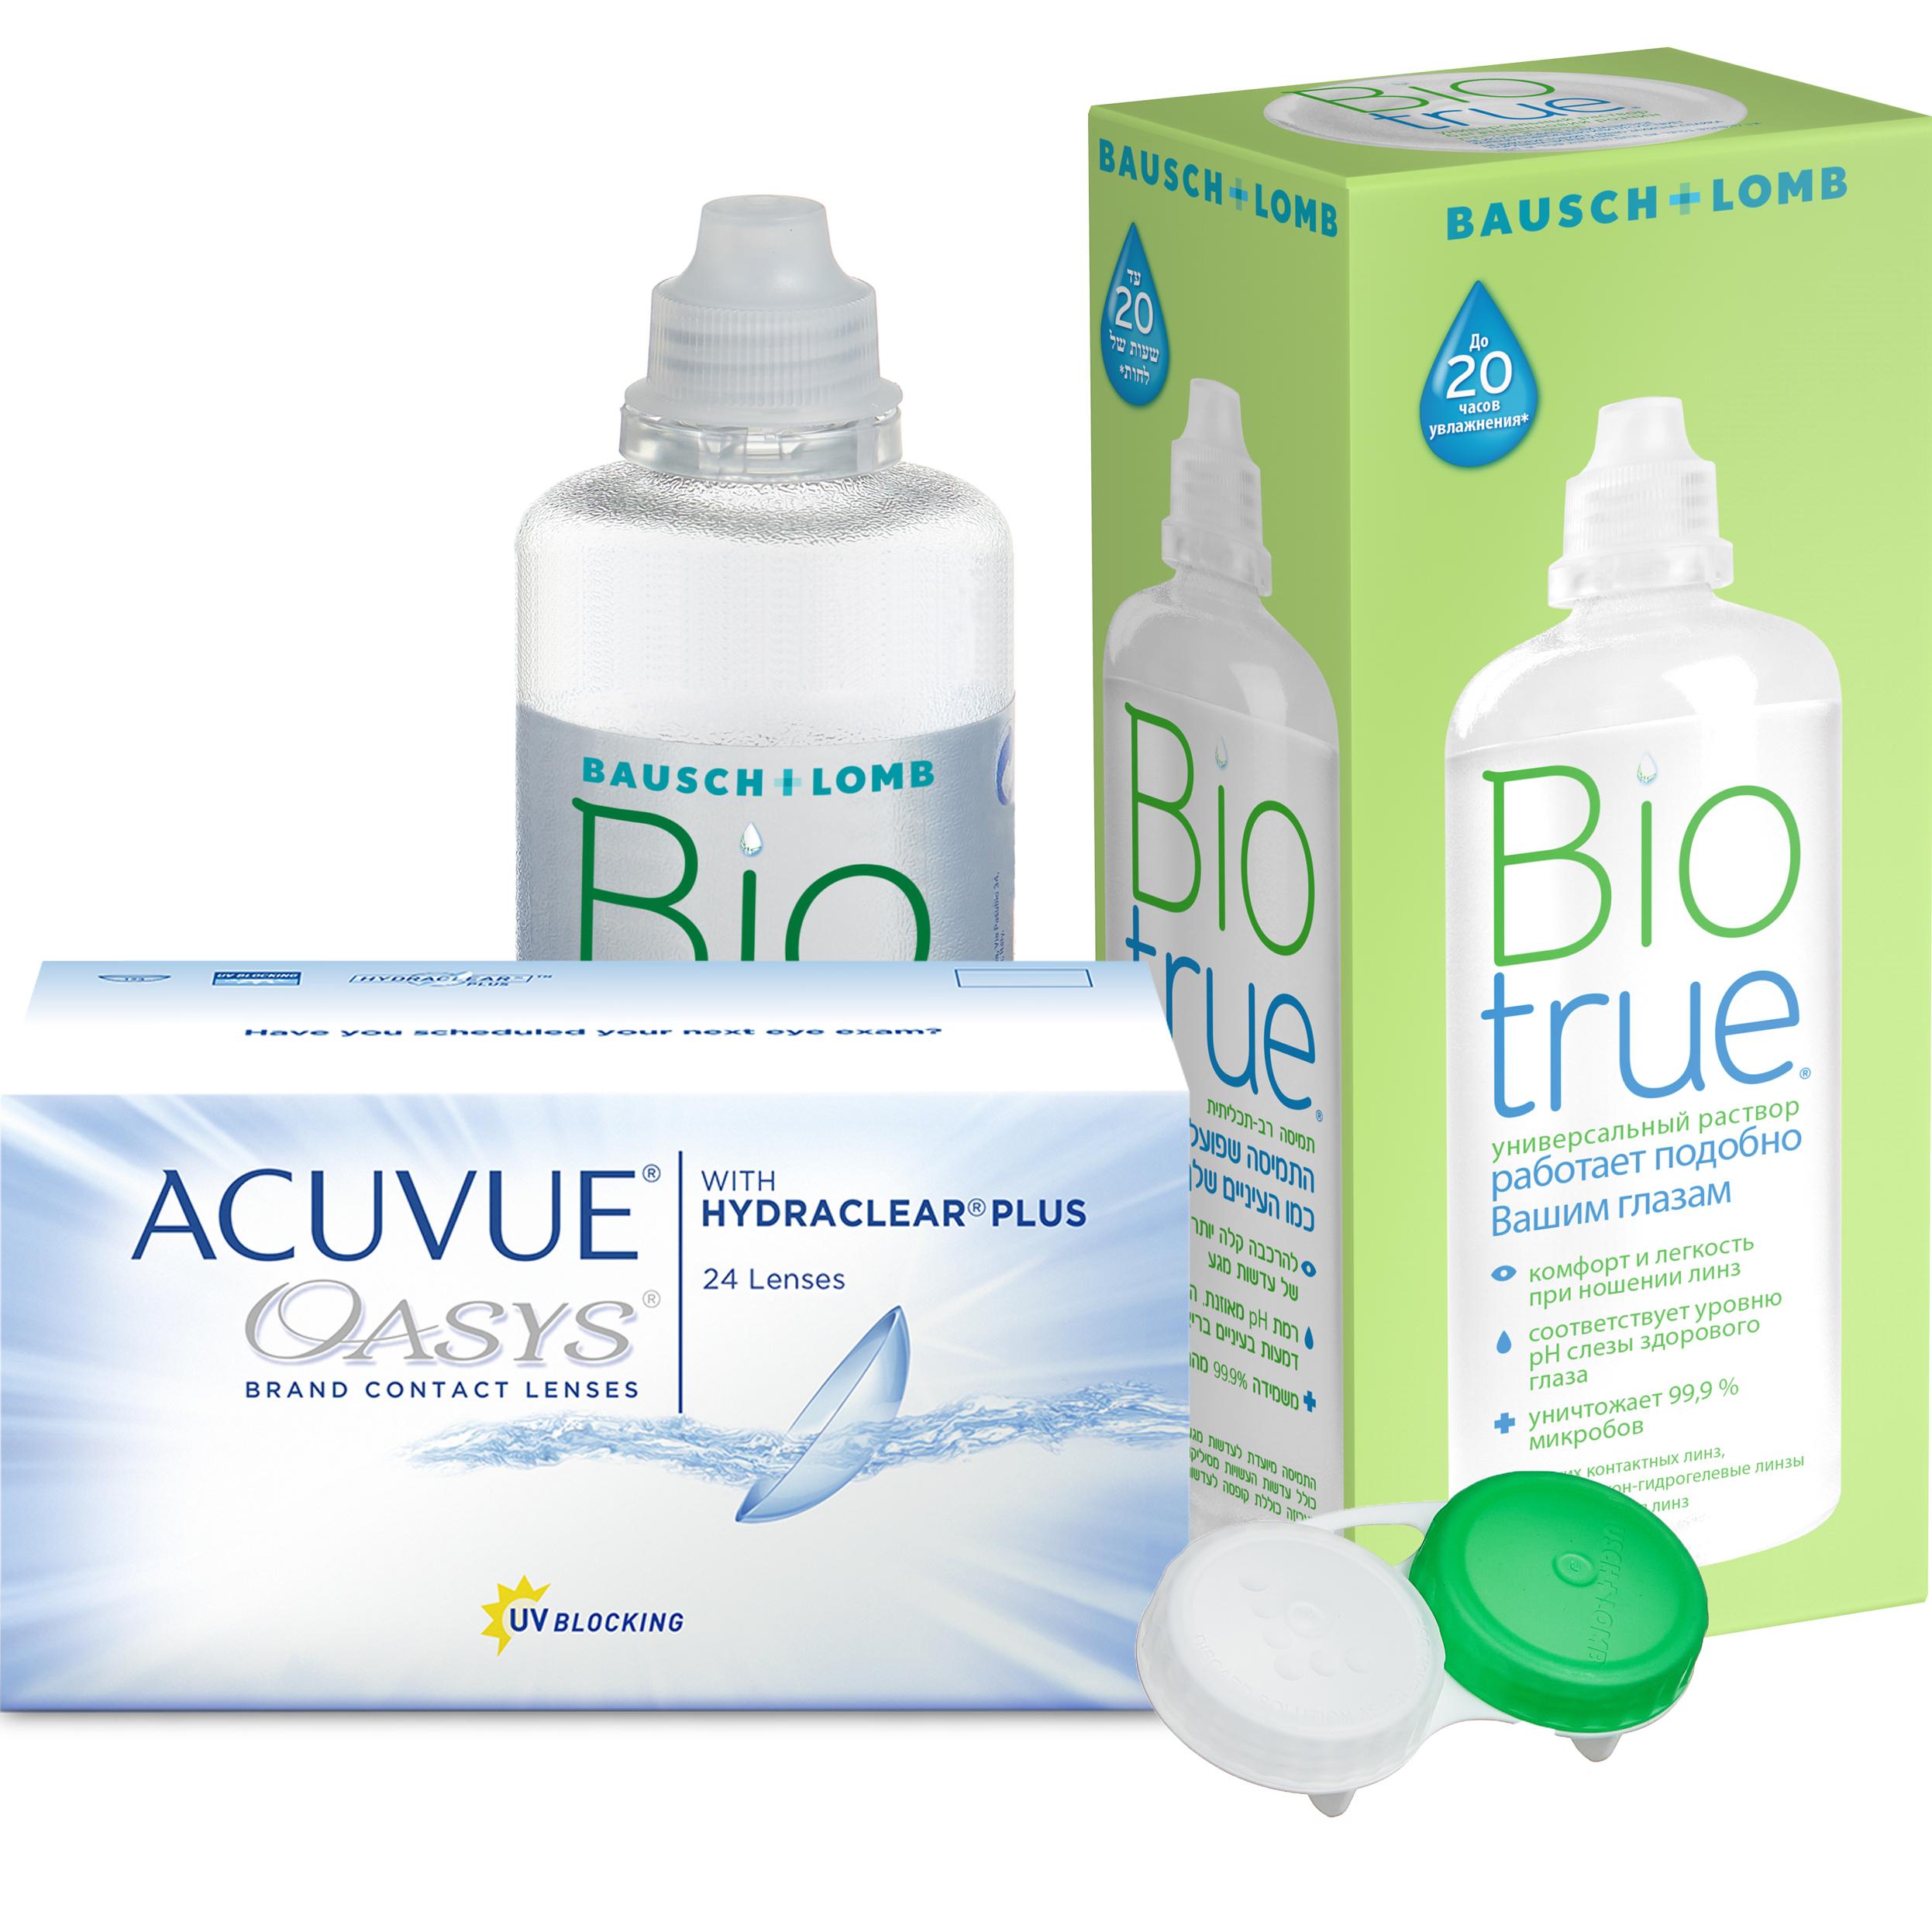 Купить Oasys with Hydraclear Plus 24 линзы + Biotrue, Контактные линзы Acuvue Oasys with Hydraclear Plus 24 линзы R 8.8 -2, 00 + Biotrue 300 мл